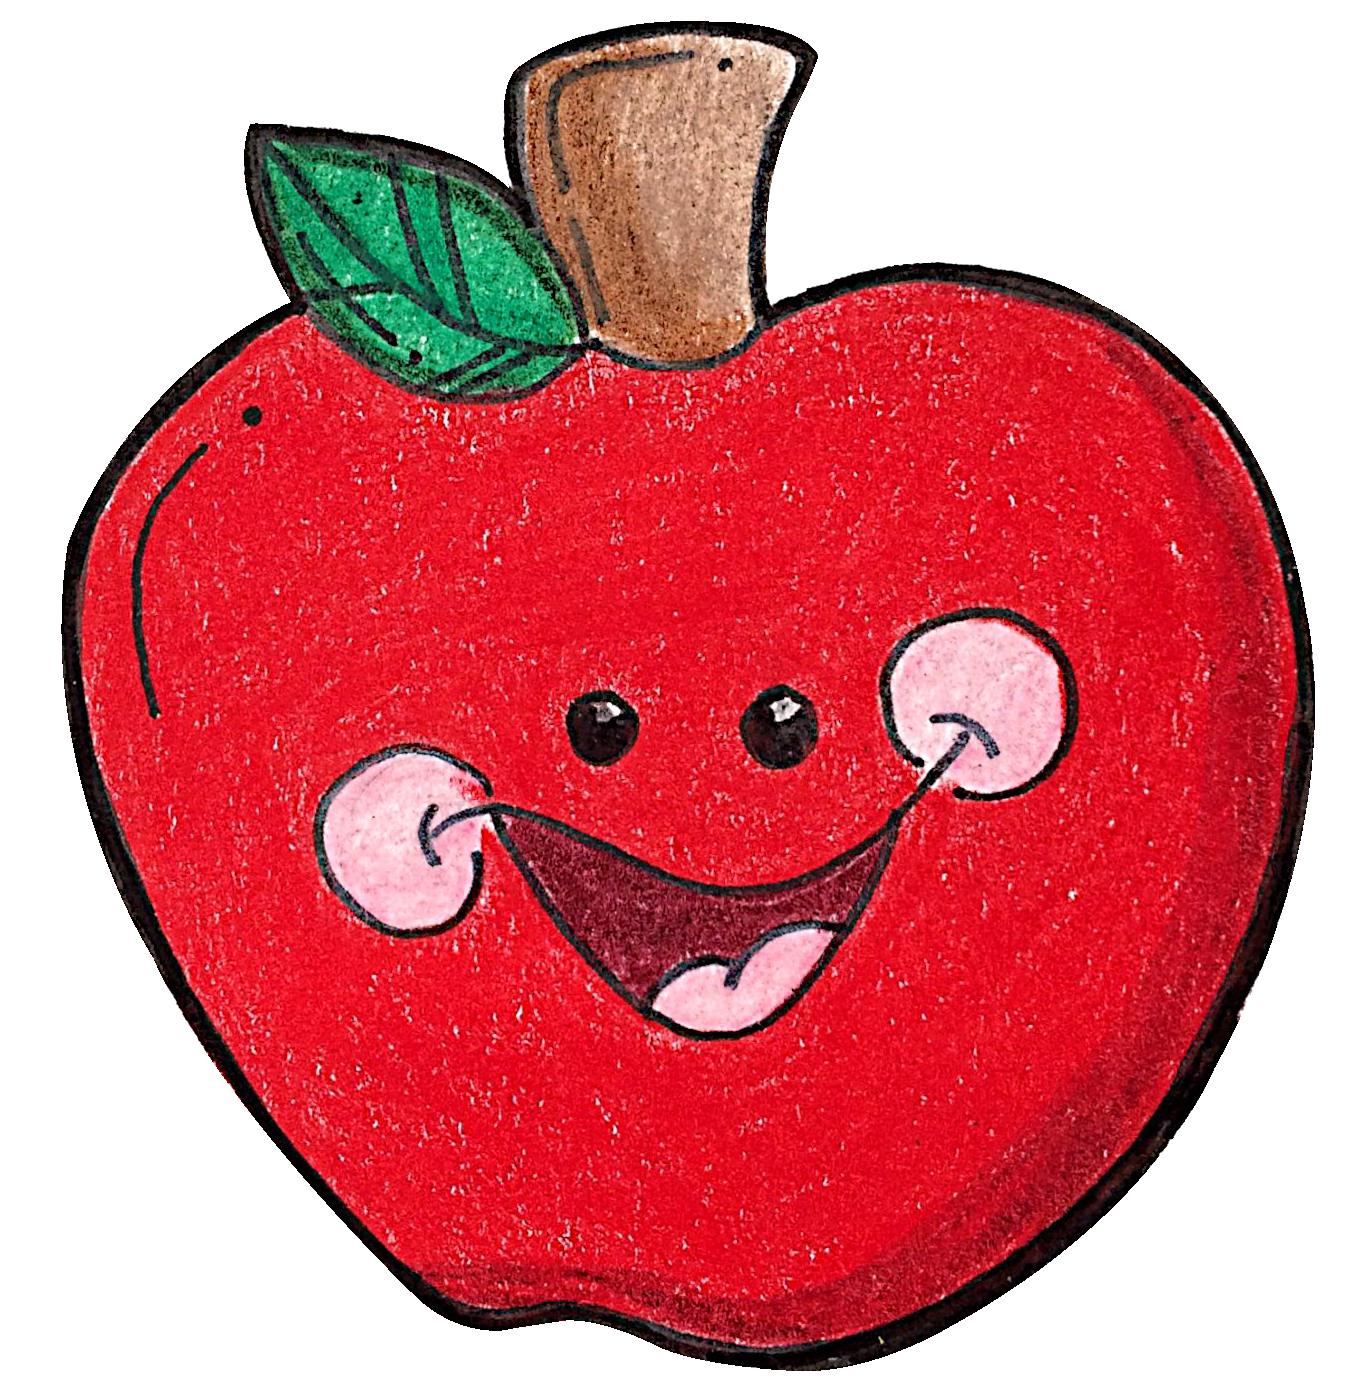 free apple clipart download [ 1352 x 1392 Pixel ]